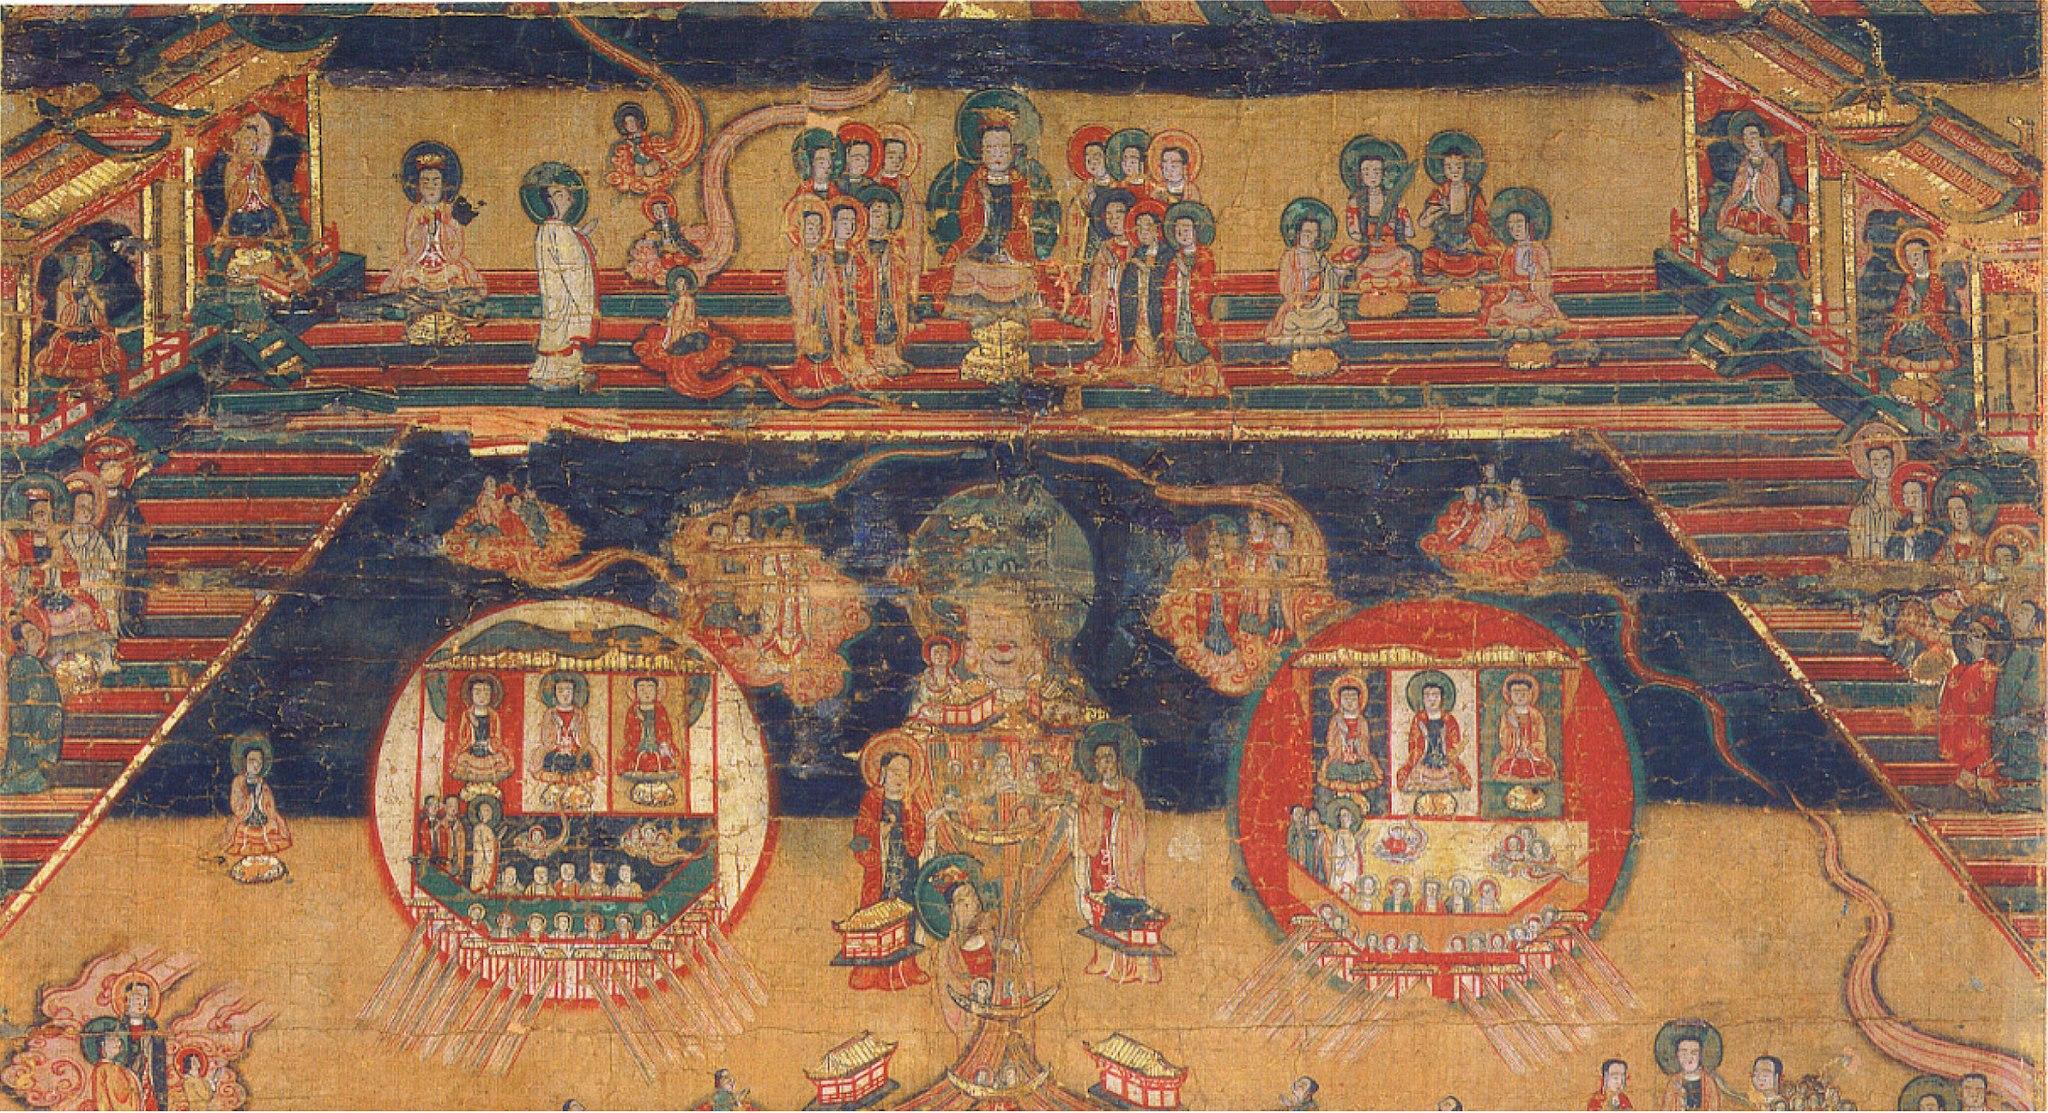 Cathayan Manichaean Cosmology - Heaven Scene